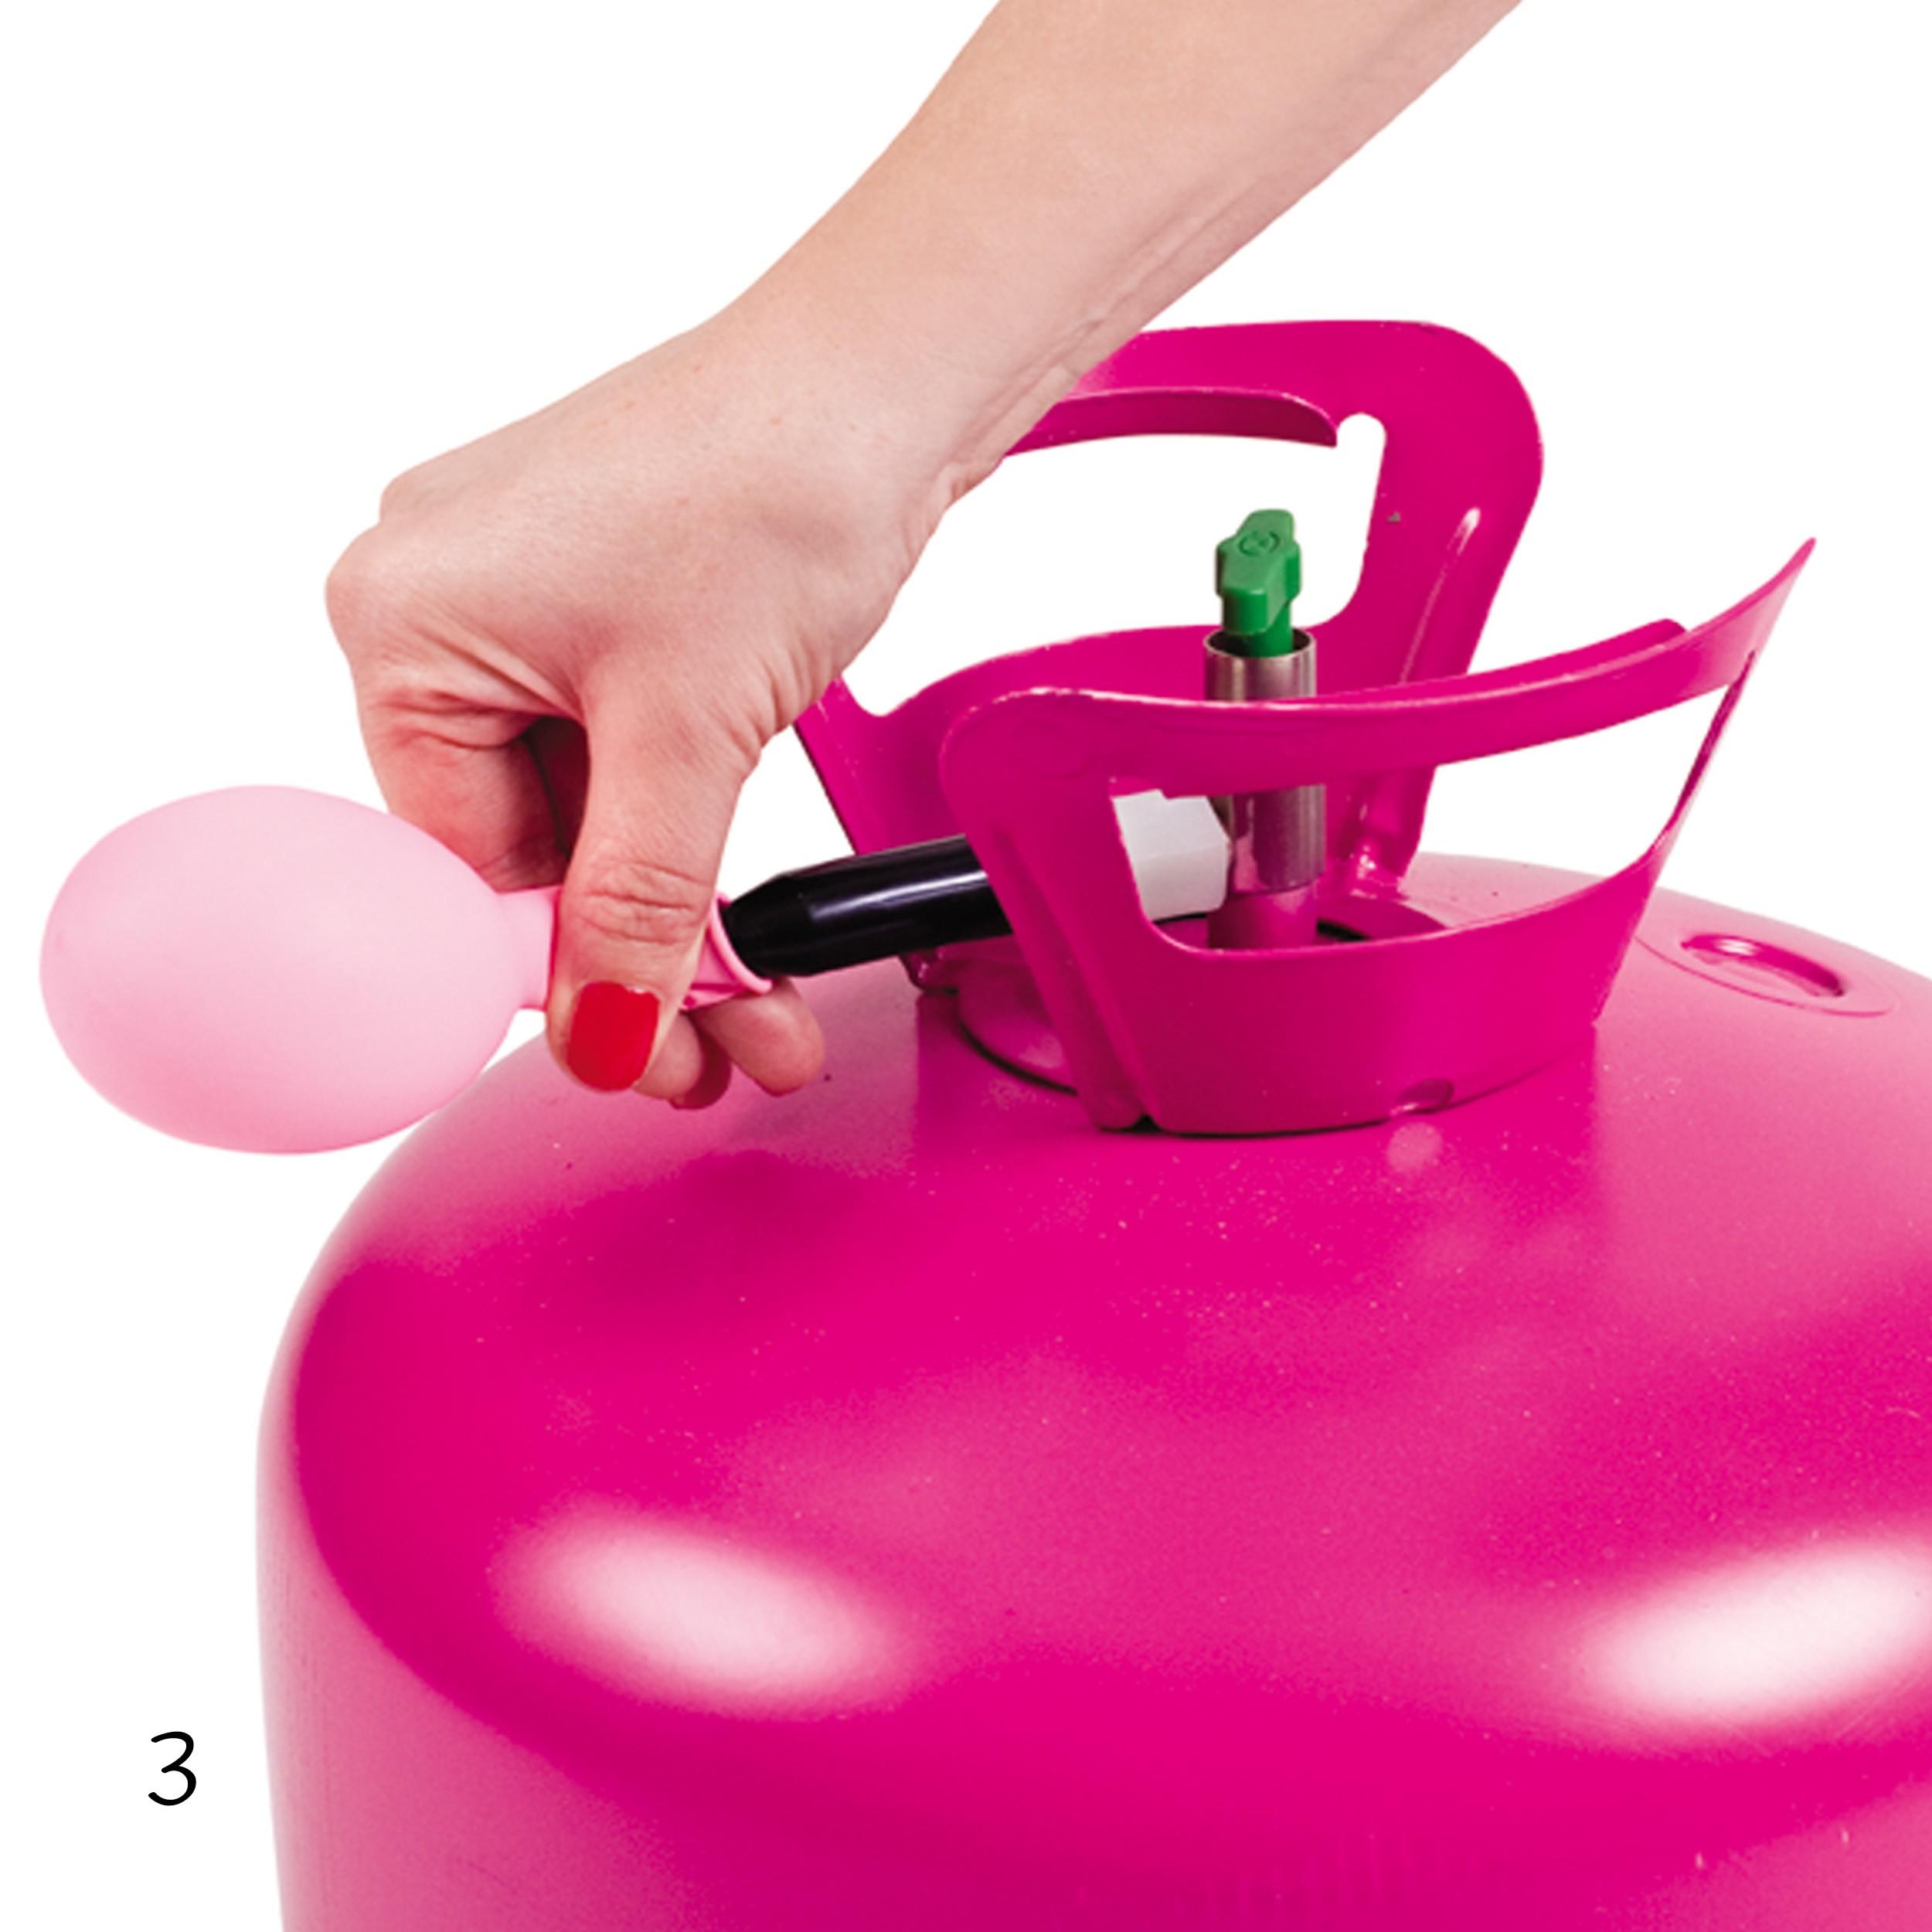 helium ballongas f r 30 luftballons heliumflasche folienballons hochzeit party ebay. Black Bedroom Furniture Sets. Home Design Ideas